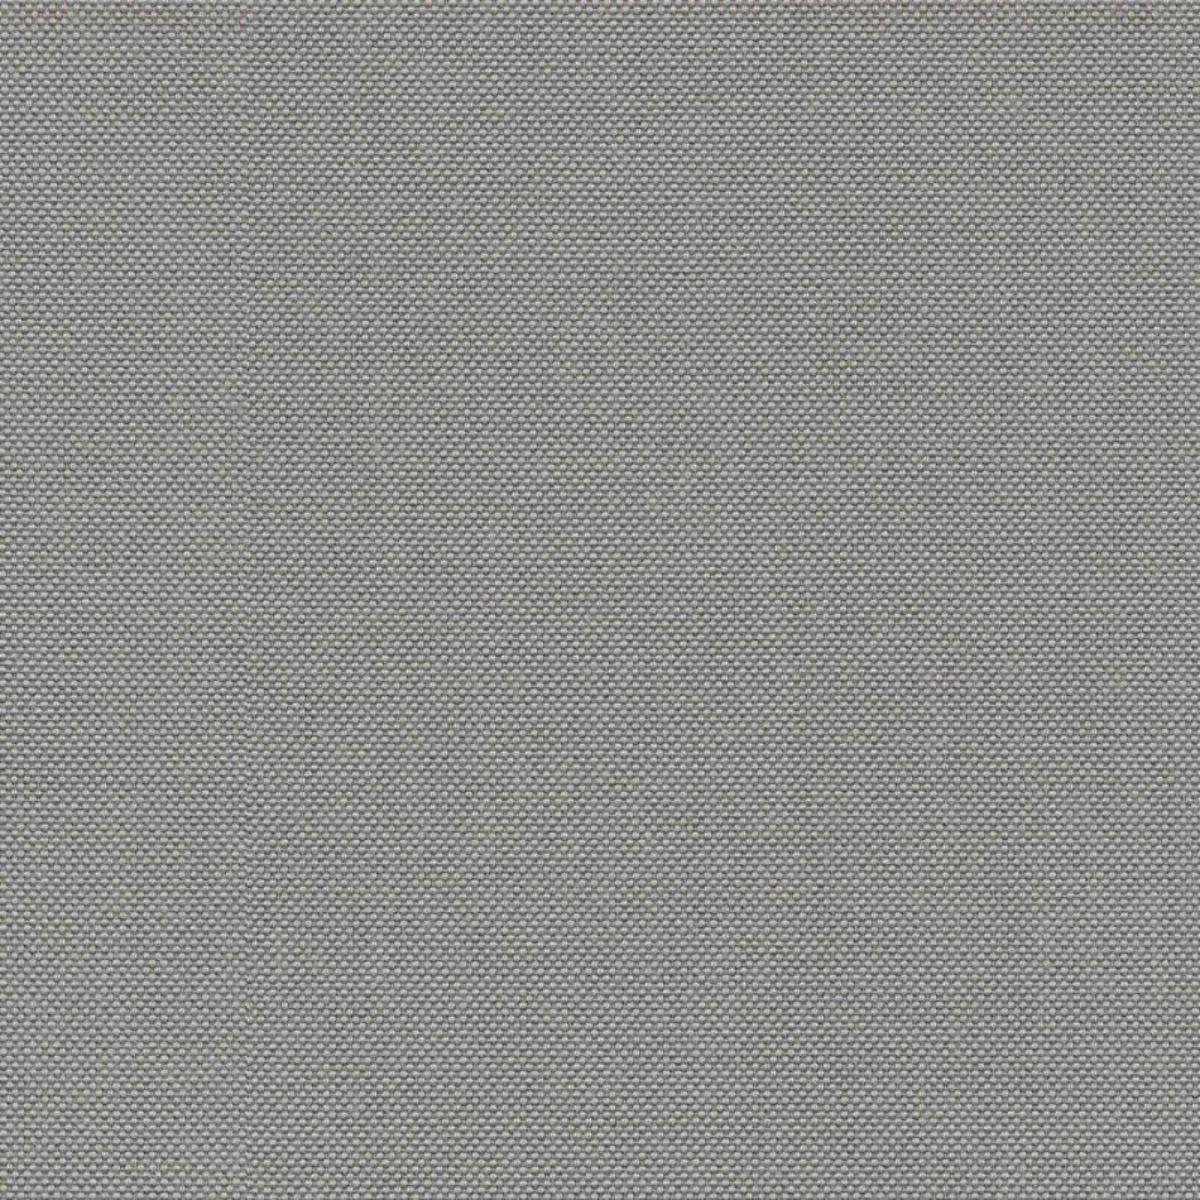 SUNBRELLA natté nature grey stof kopen